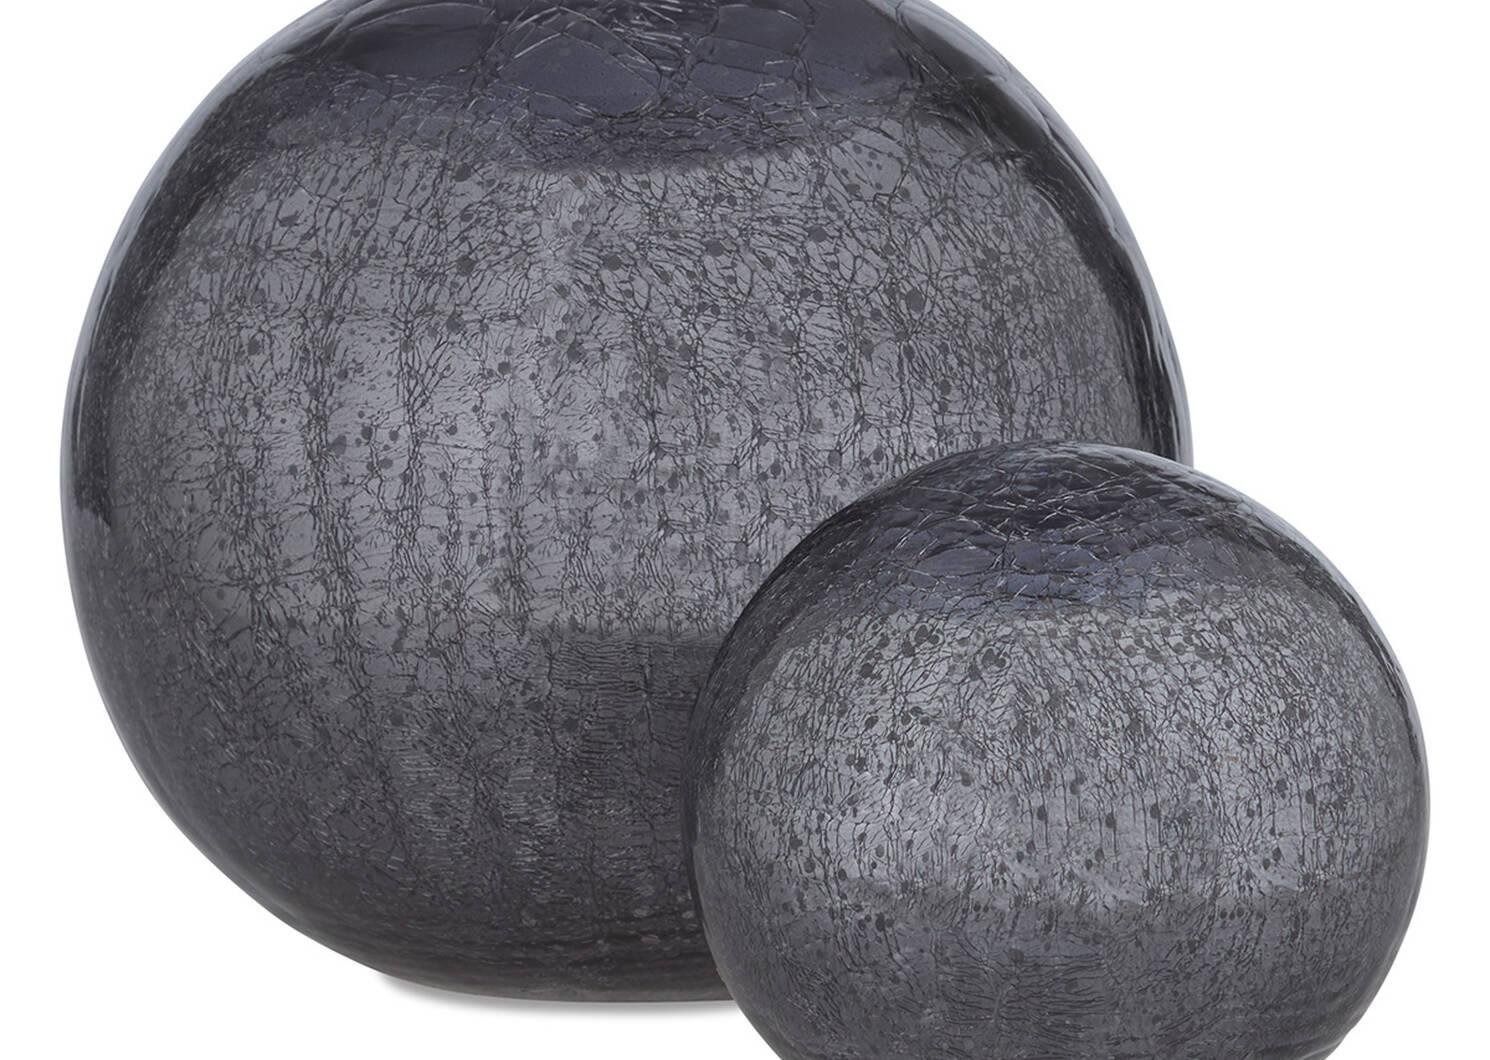 Donatella Decor Ball Small Charcoal